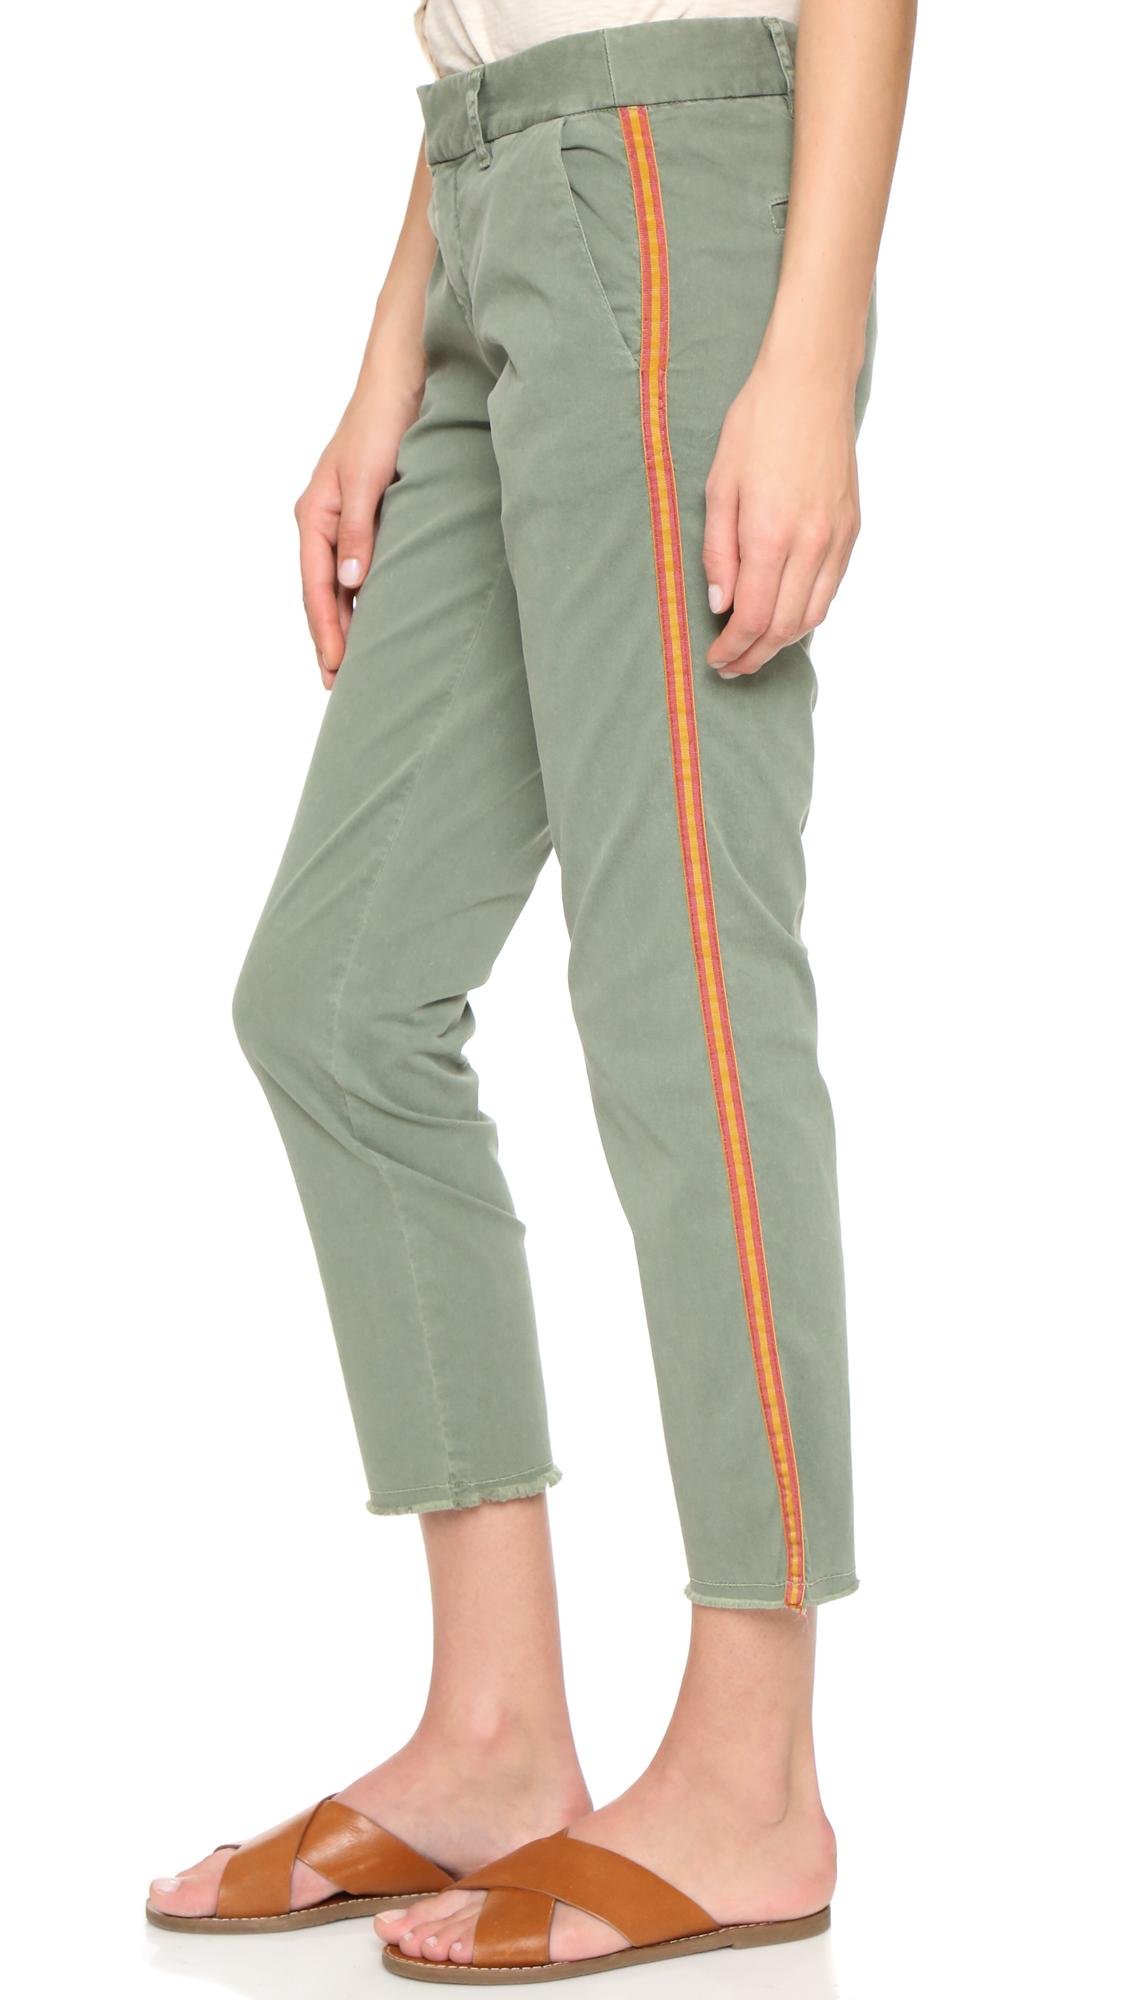 437b573b6 Nili Lotan East Hampton Pants with Tape | SHOPBOP